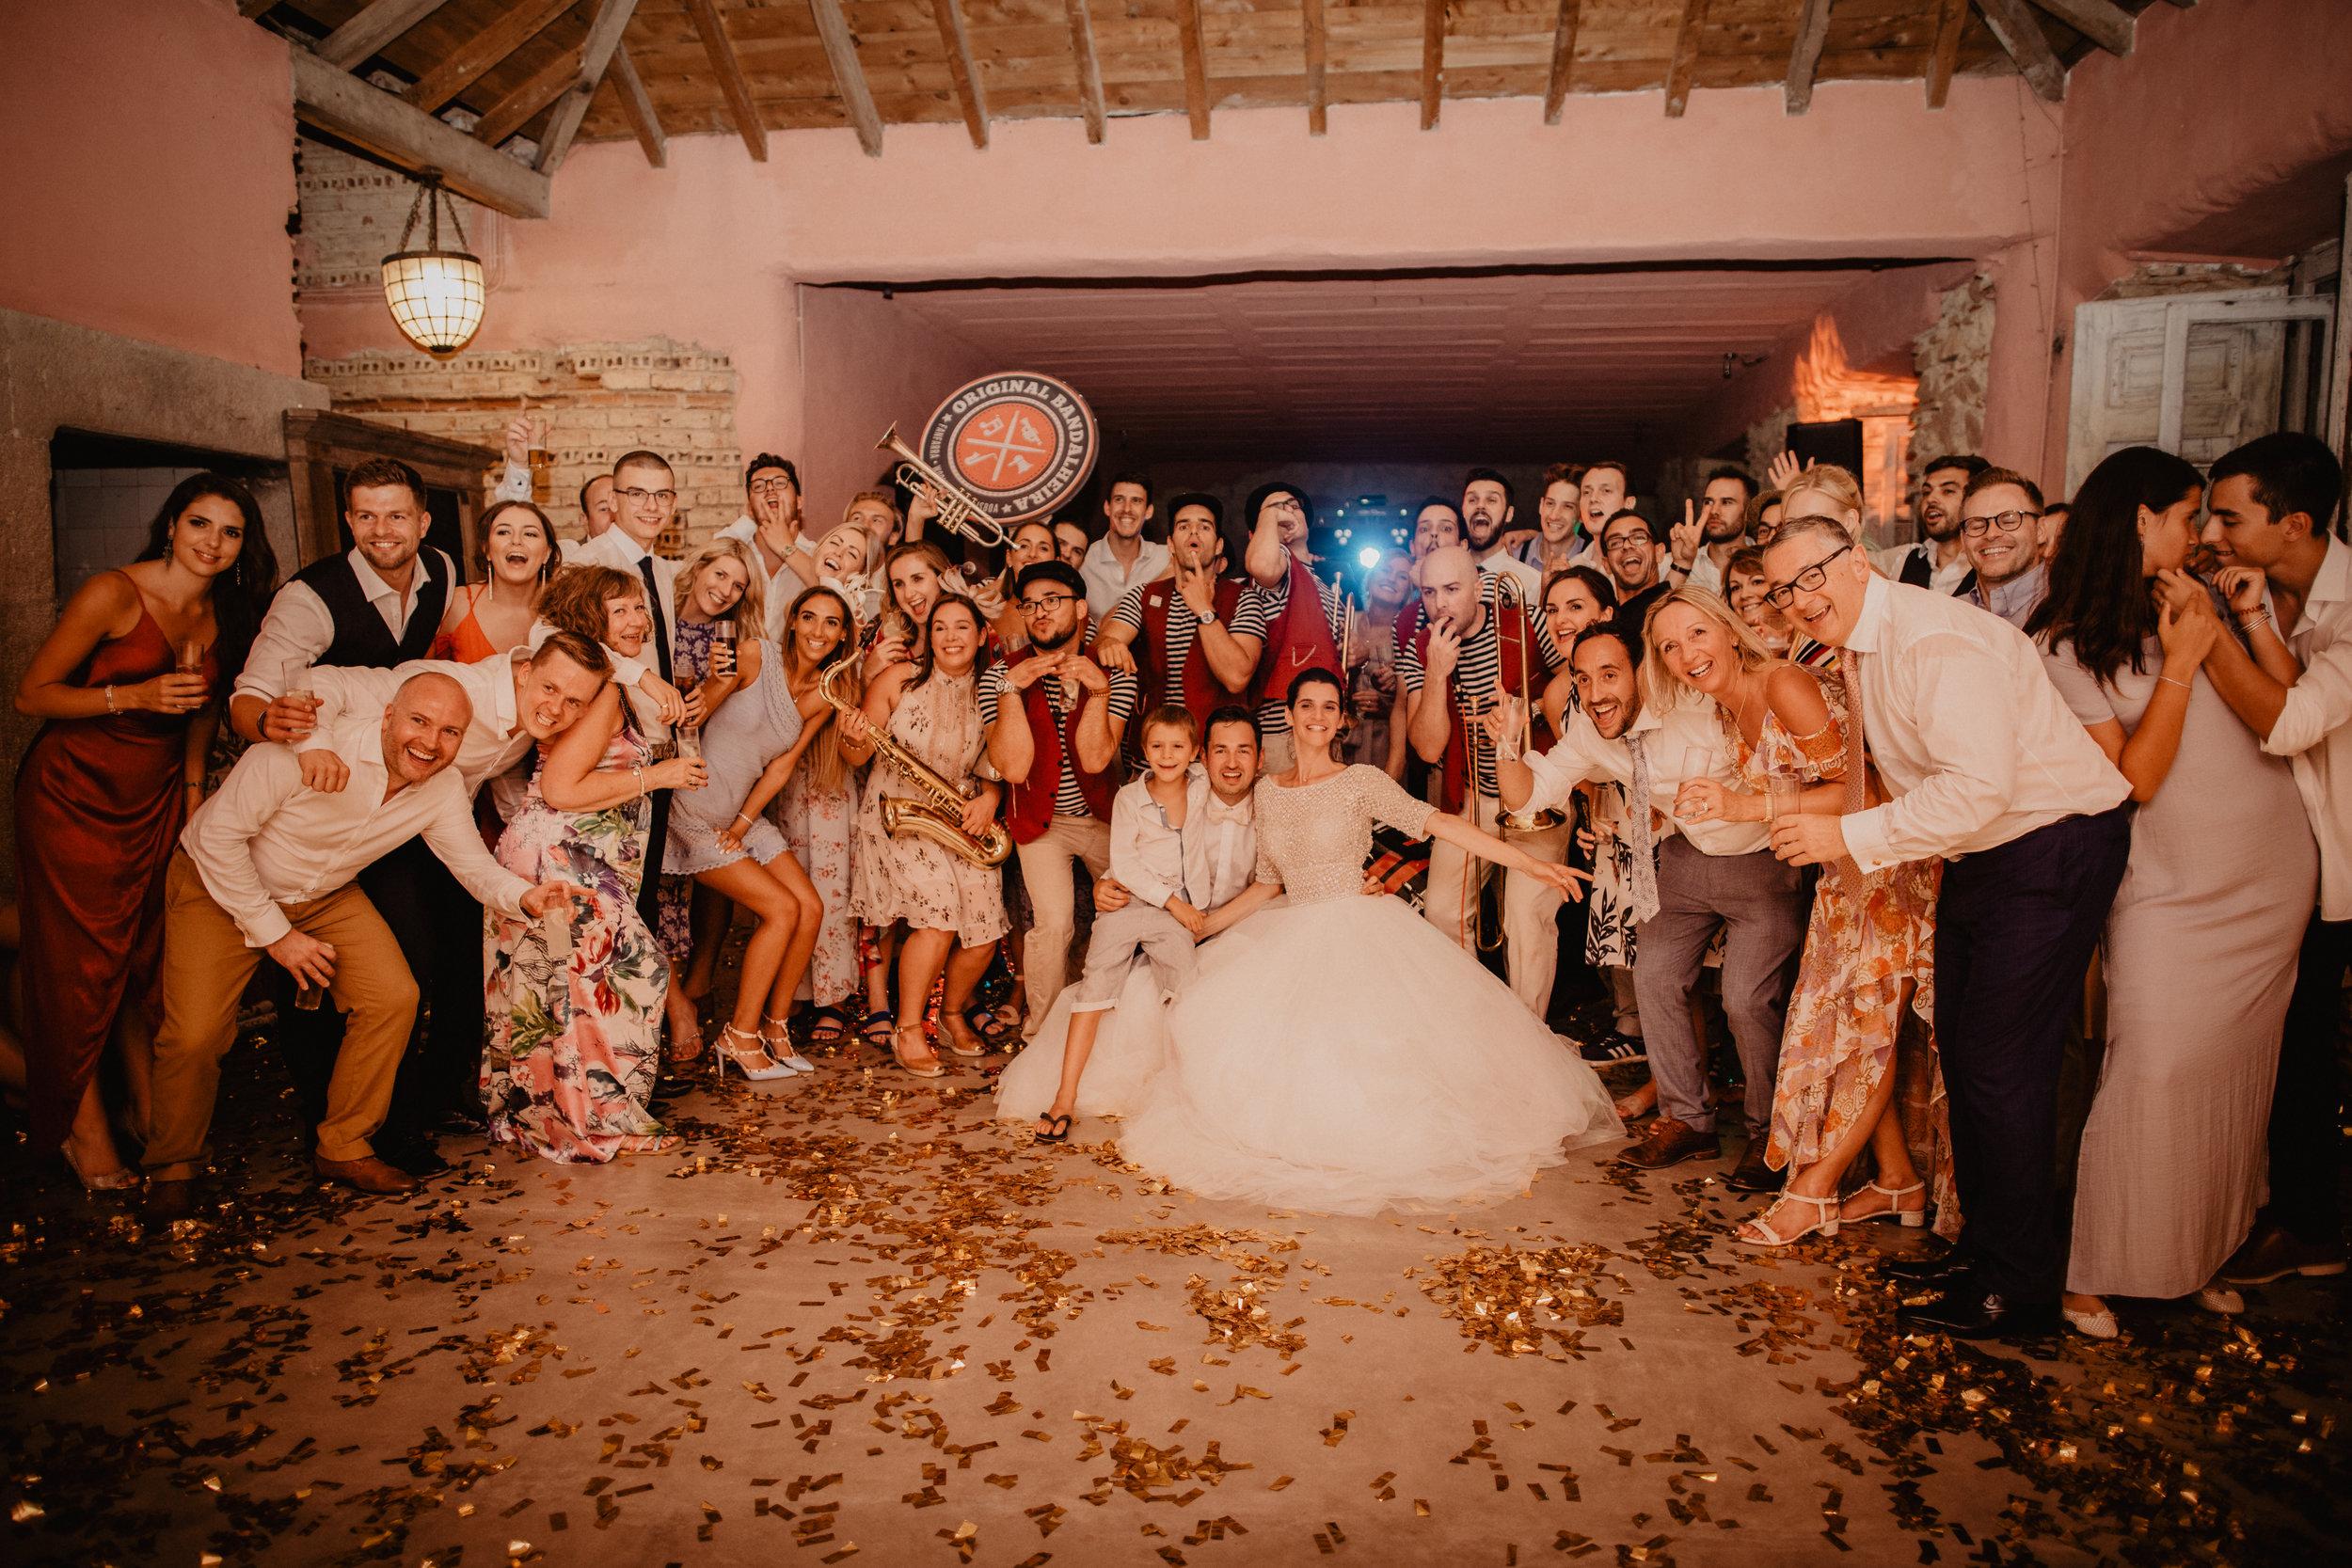 Lapela-photography-wedding-sintra-portugal-136.jpg